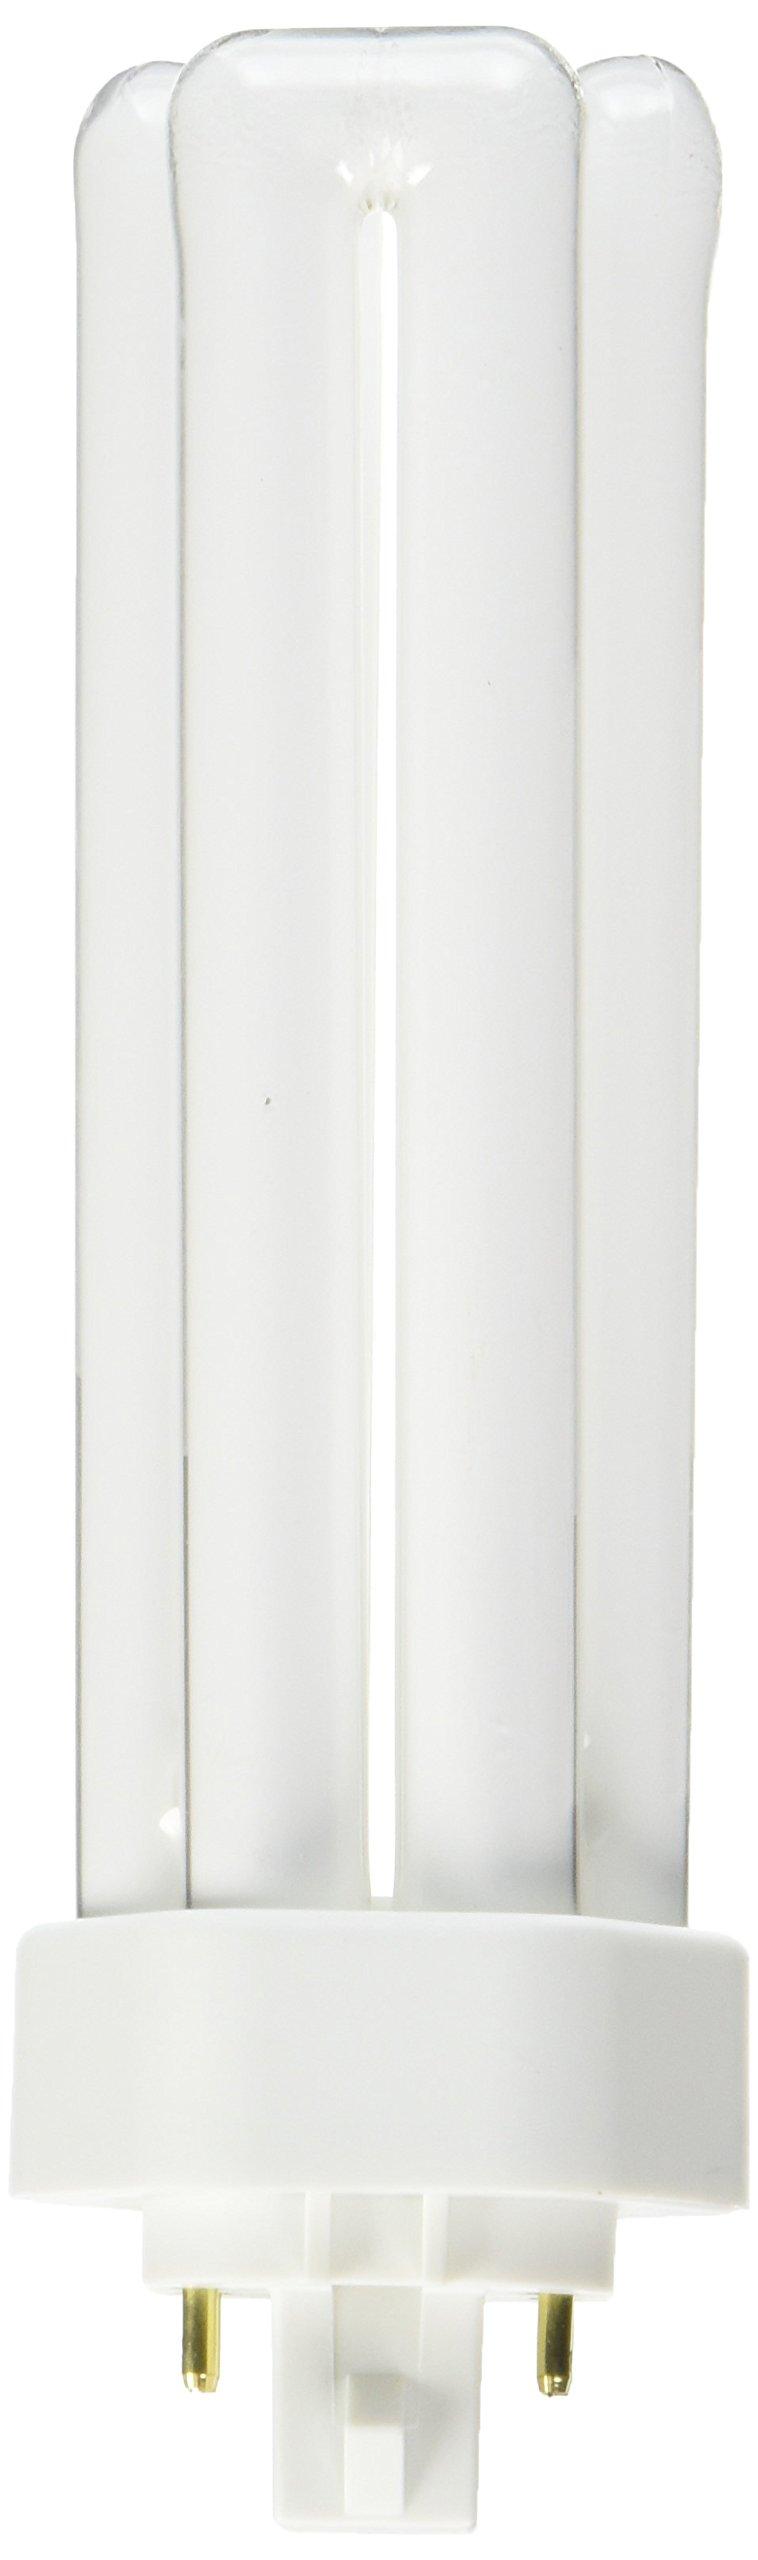 Sylvania FBA_S6755 10 Pack 20871 CF42DT/E/IN/835/ECO 42-Watt 3500K 4-Pin Triple Tube Compact Fluorescent Lamp, White